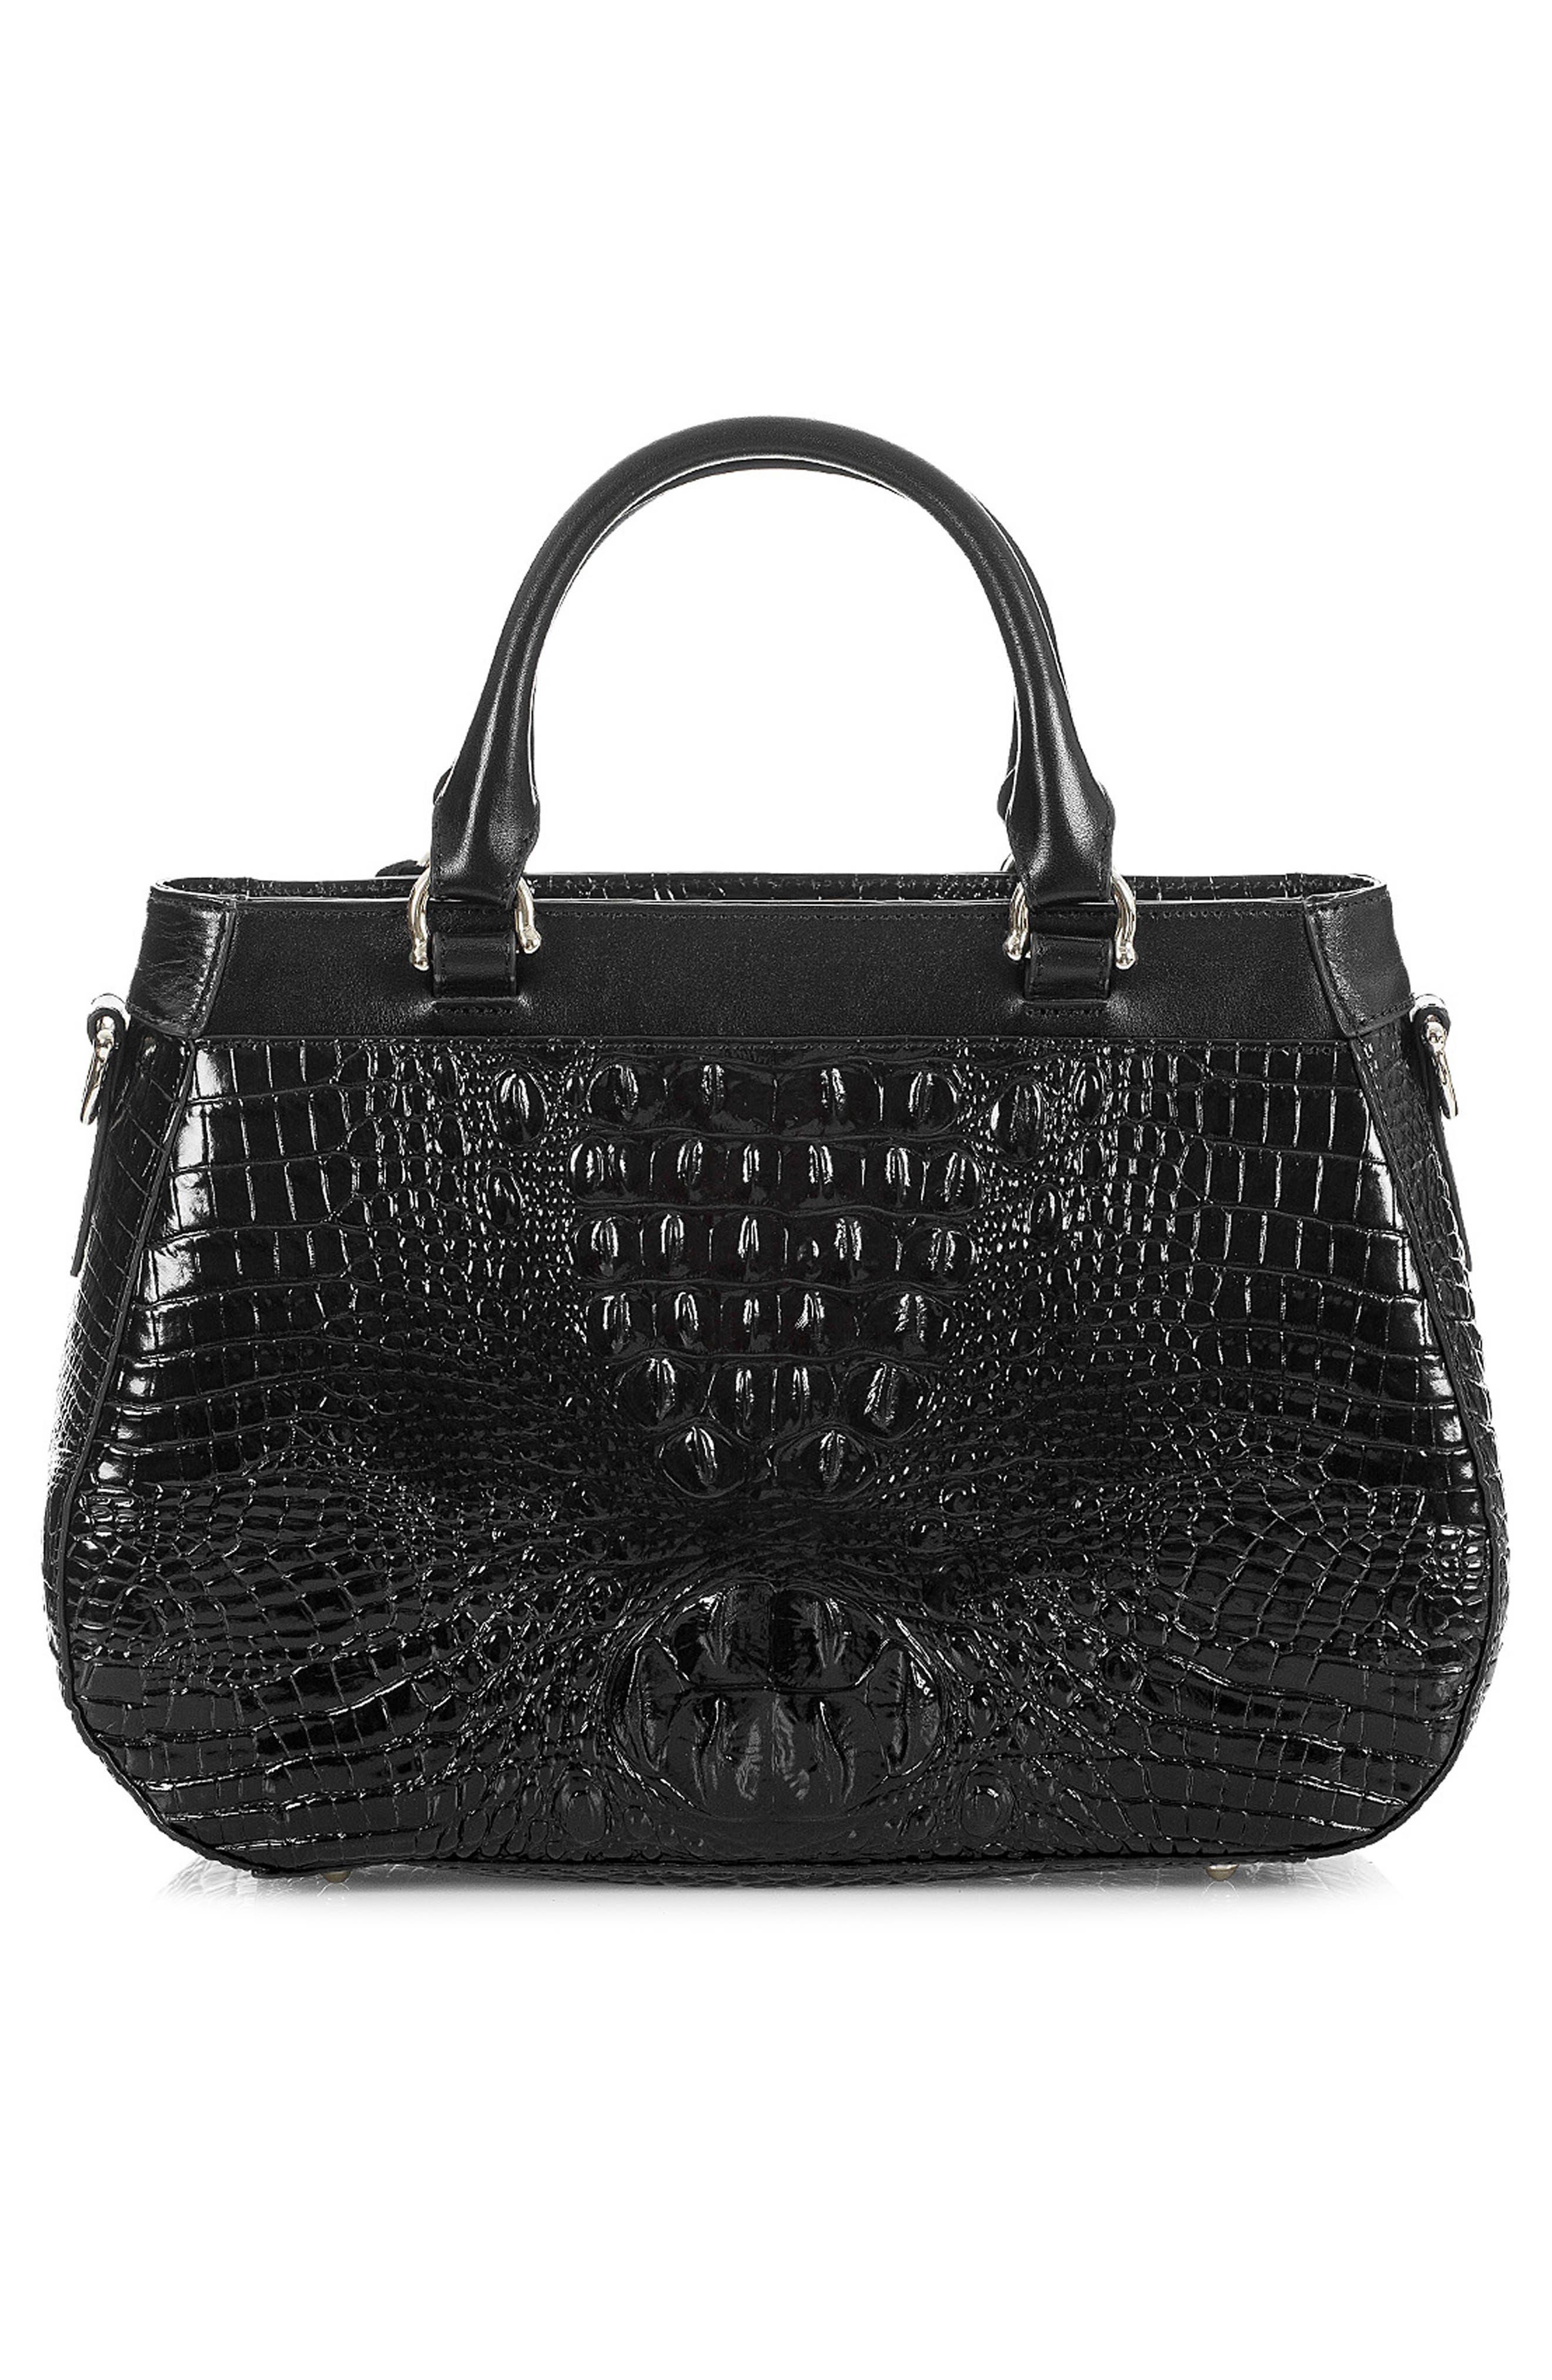 Raelynn Croc Embossed Leather Satchel,                             Alternate thumbnail 3, color,                             001